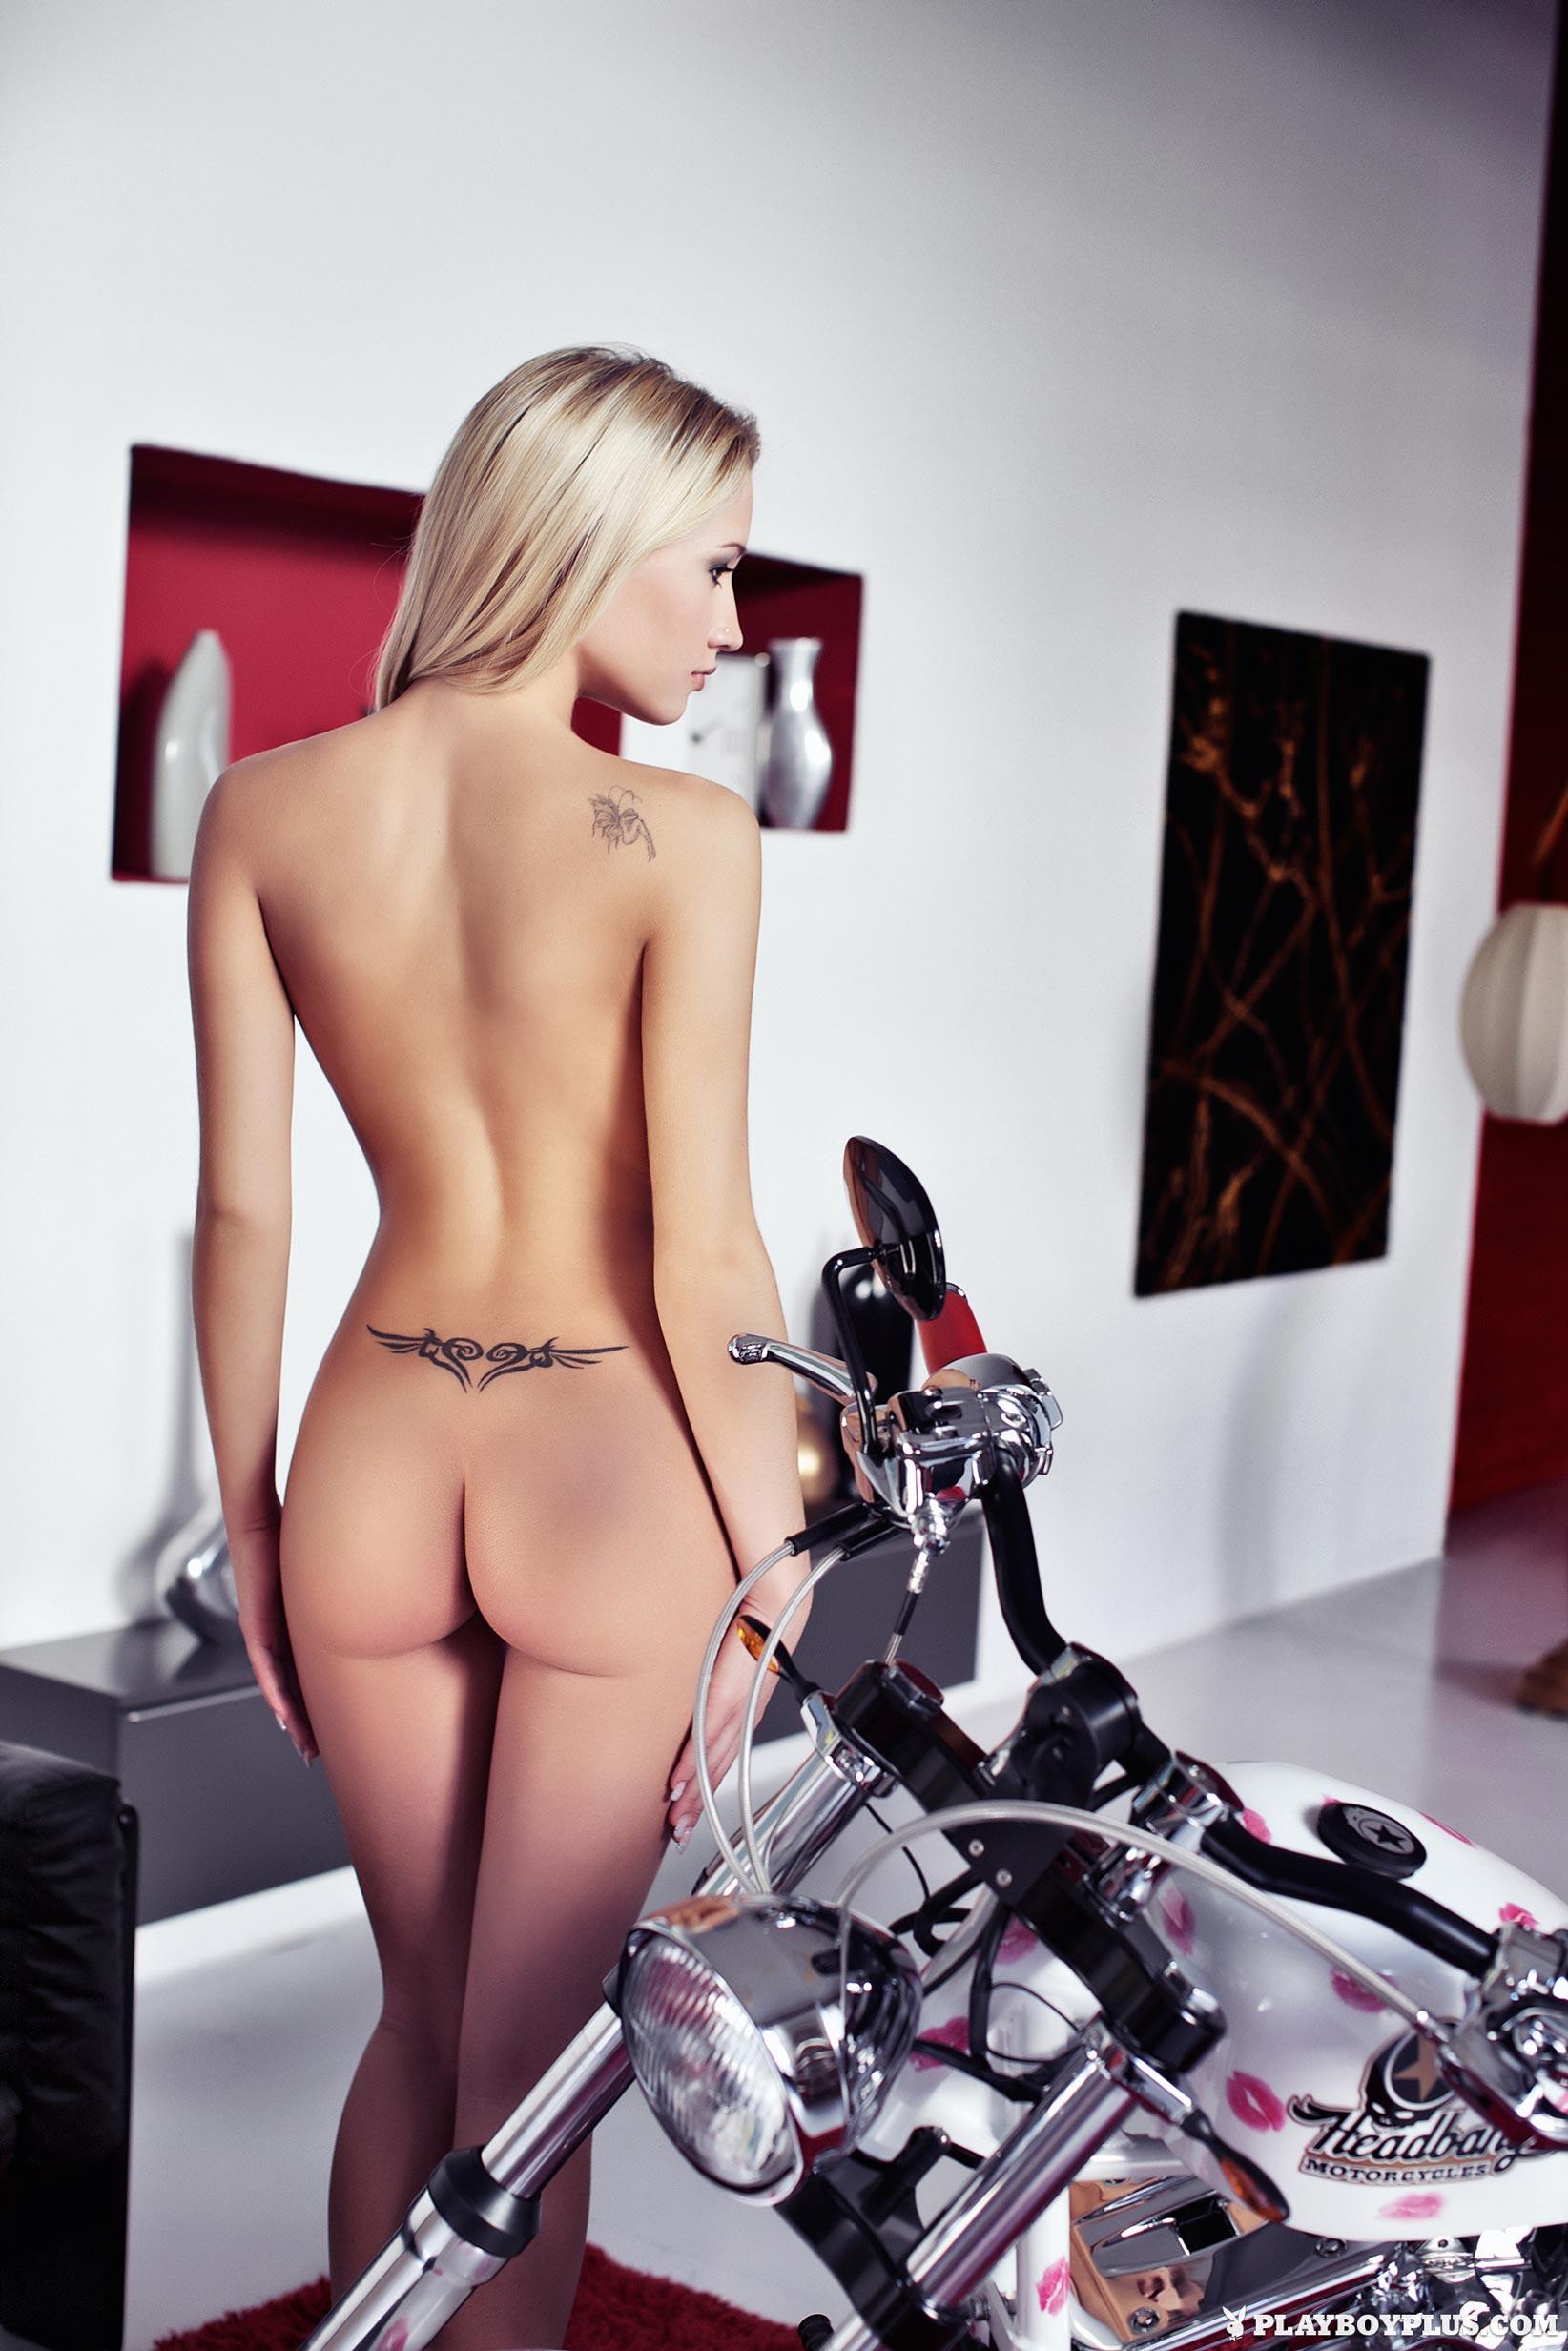 Giulia Borio In Playboy Italy - Centerfolds Blog-2901